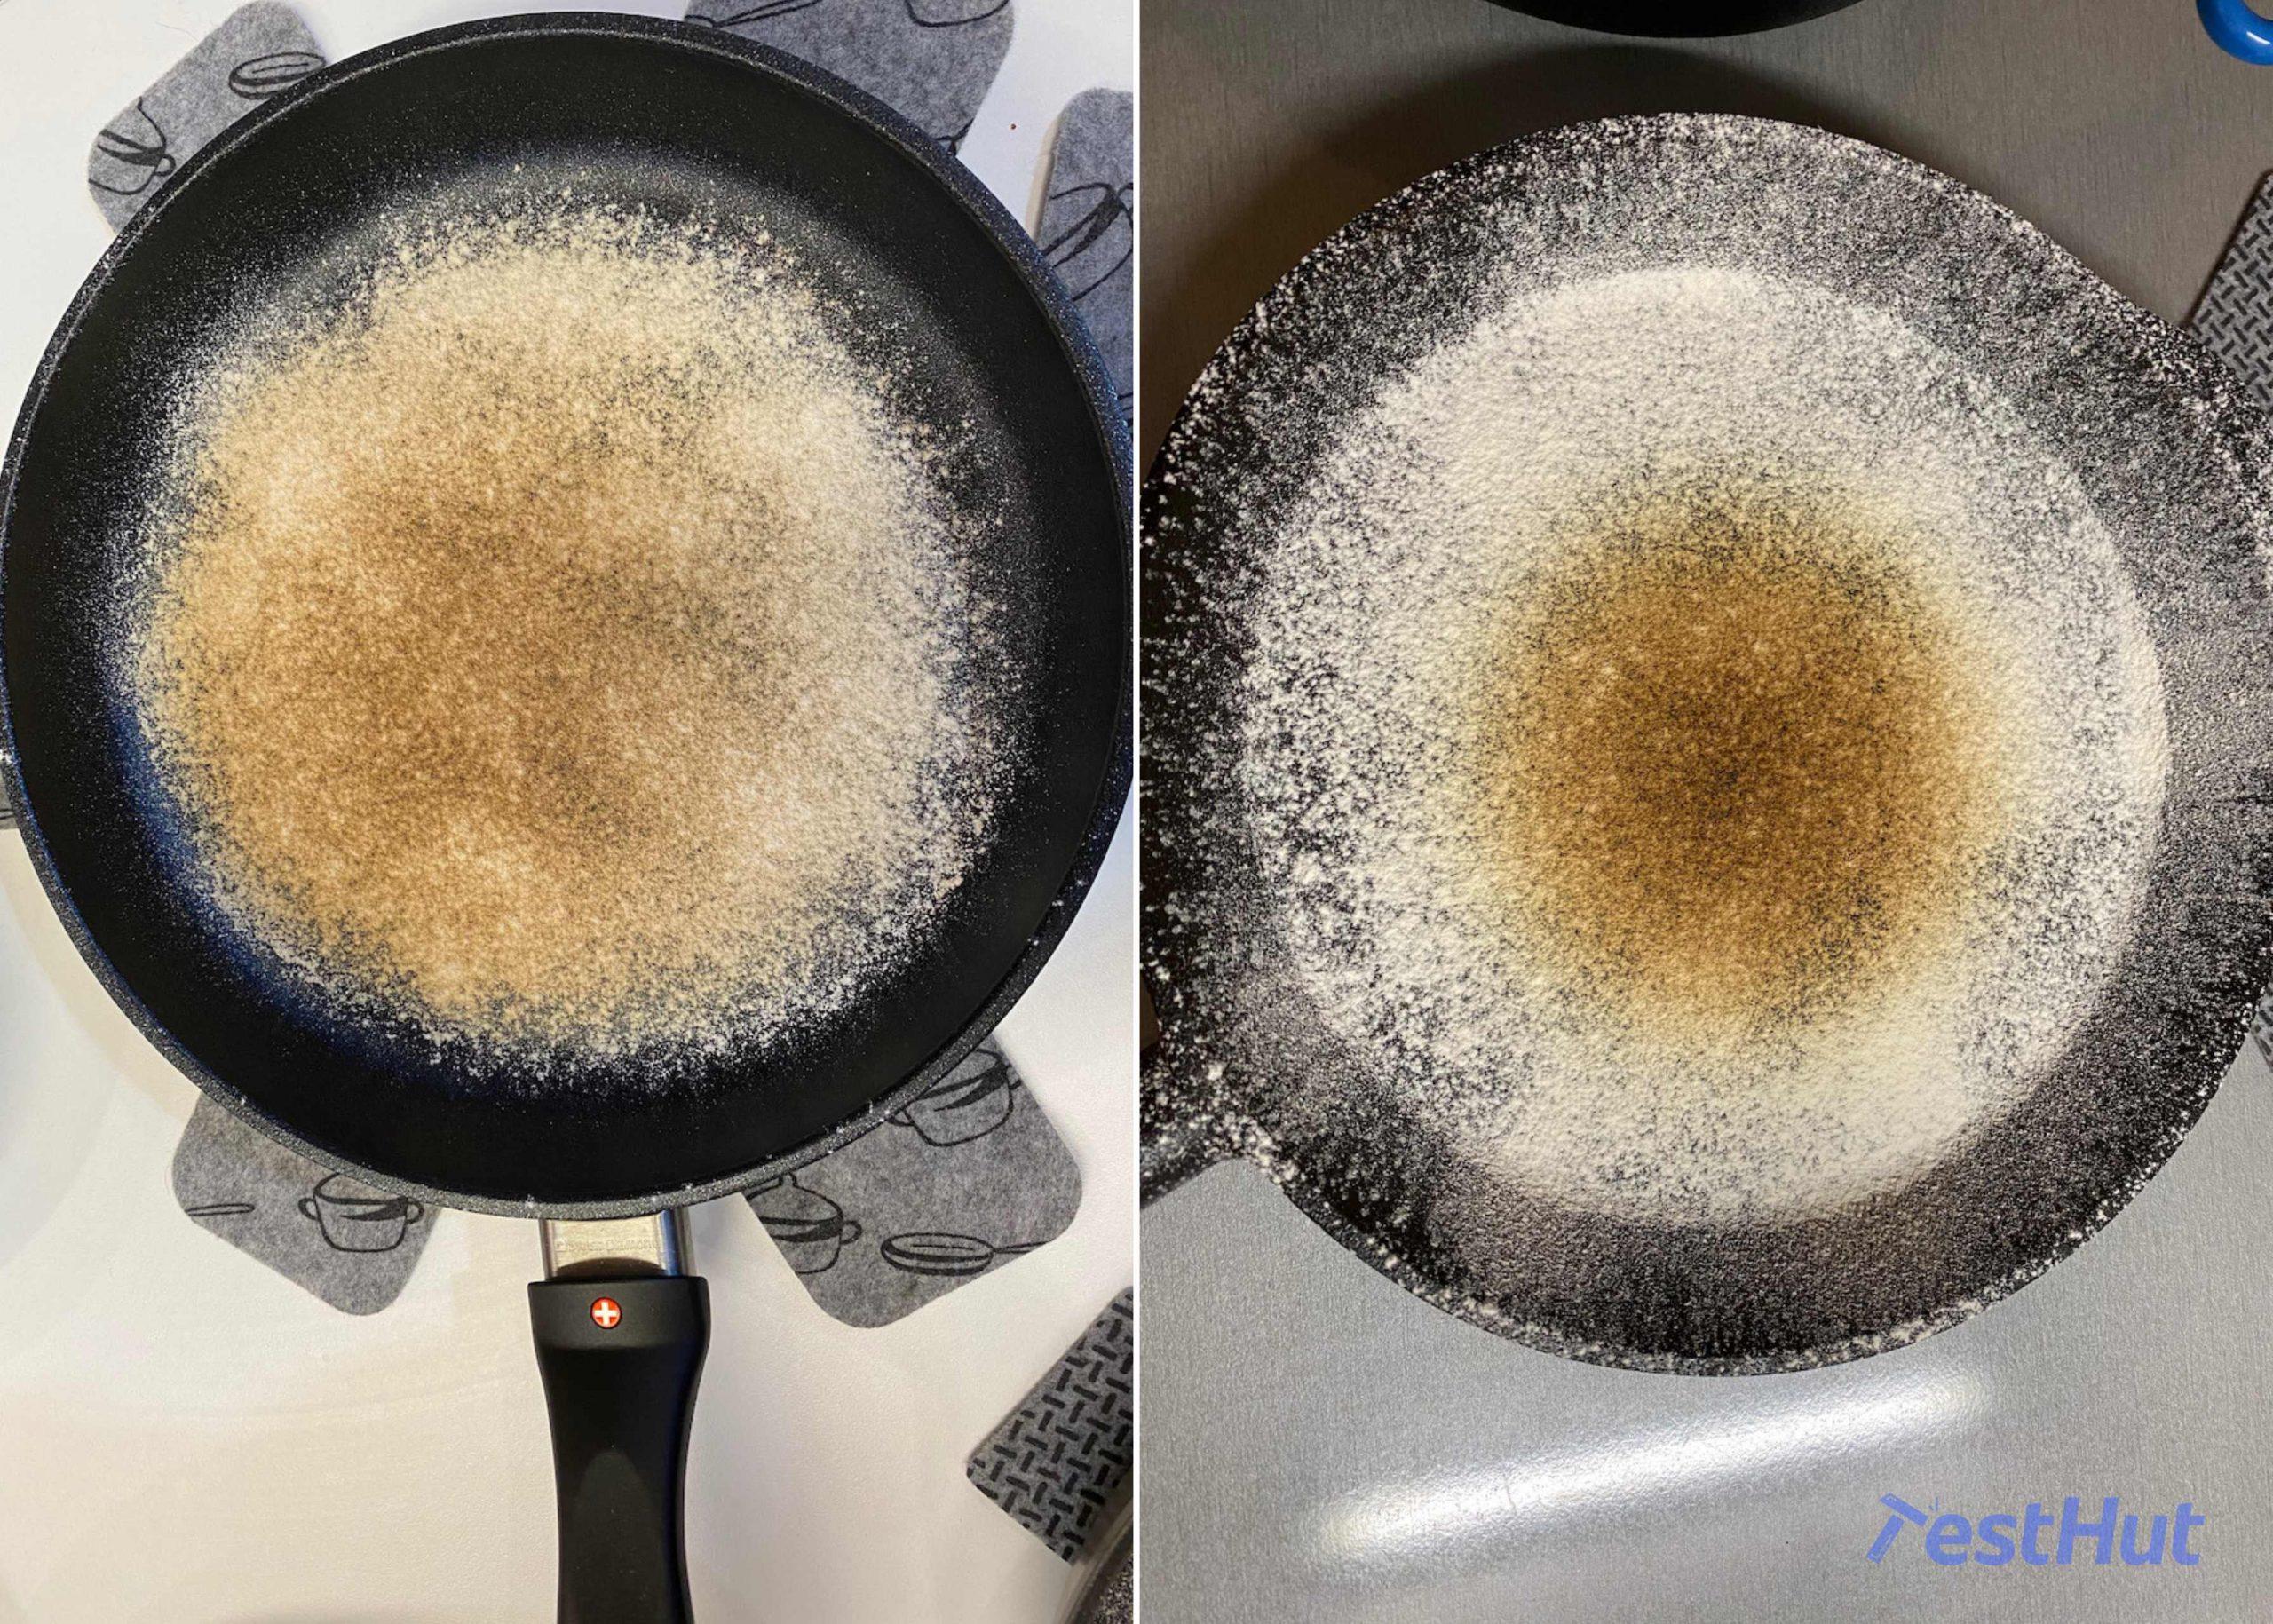 Swiss Diamond XD Induction Frying pan TestHut Flour test